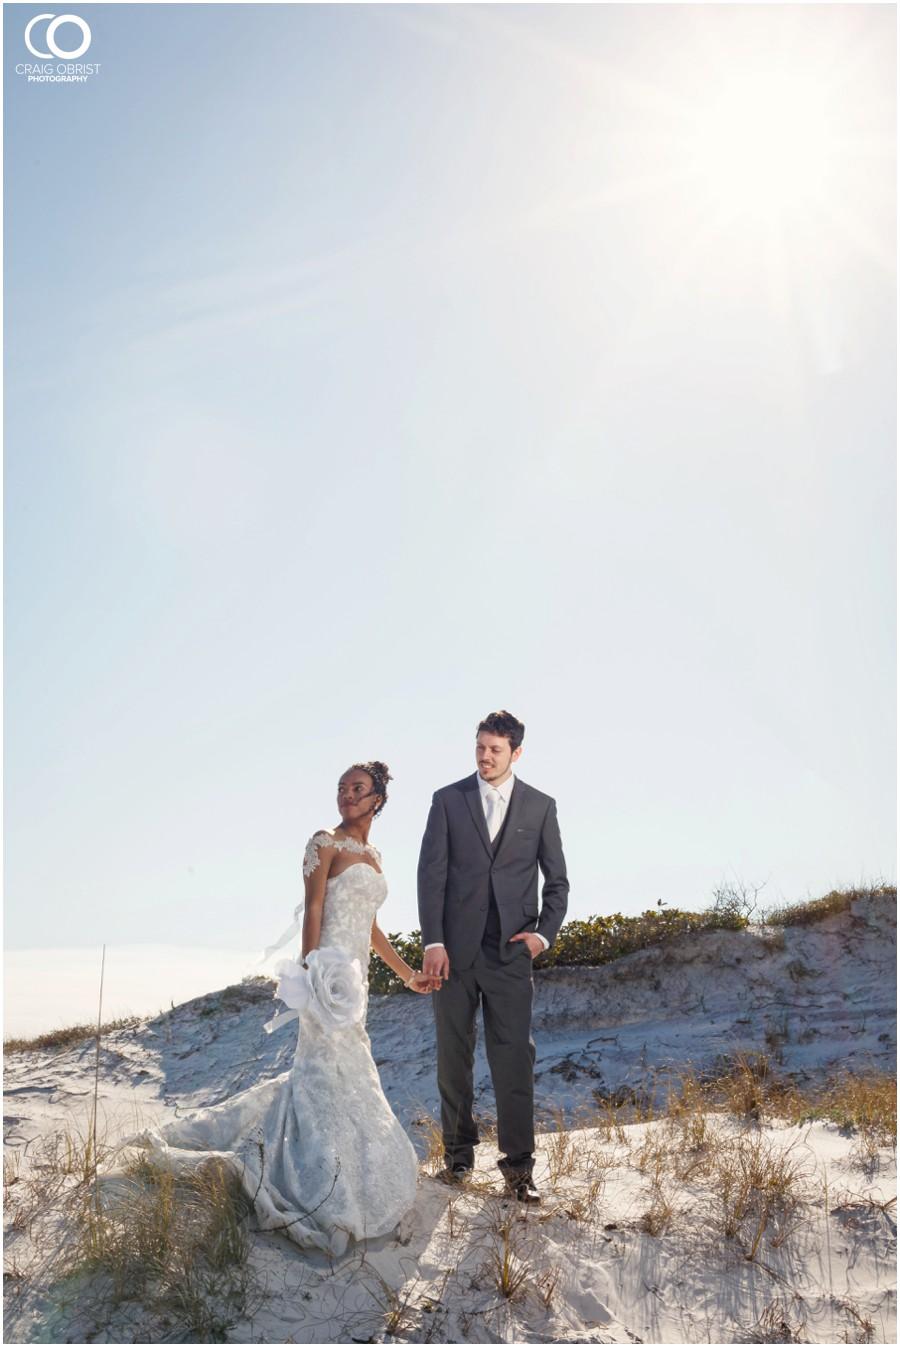 Seaside-30A-Beachside-Wedding-Sunset-Santa-Rosa-Photographer_0061.jpg